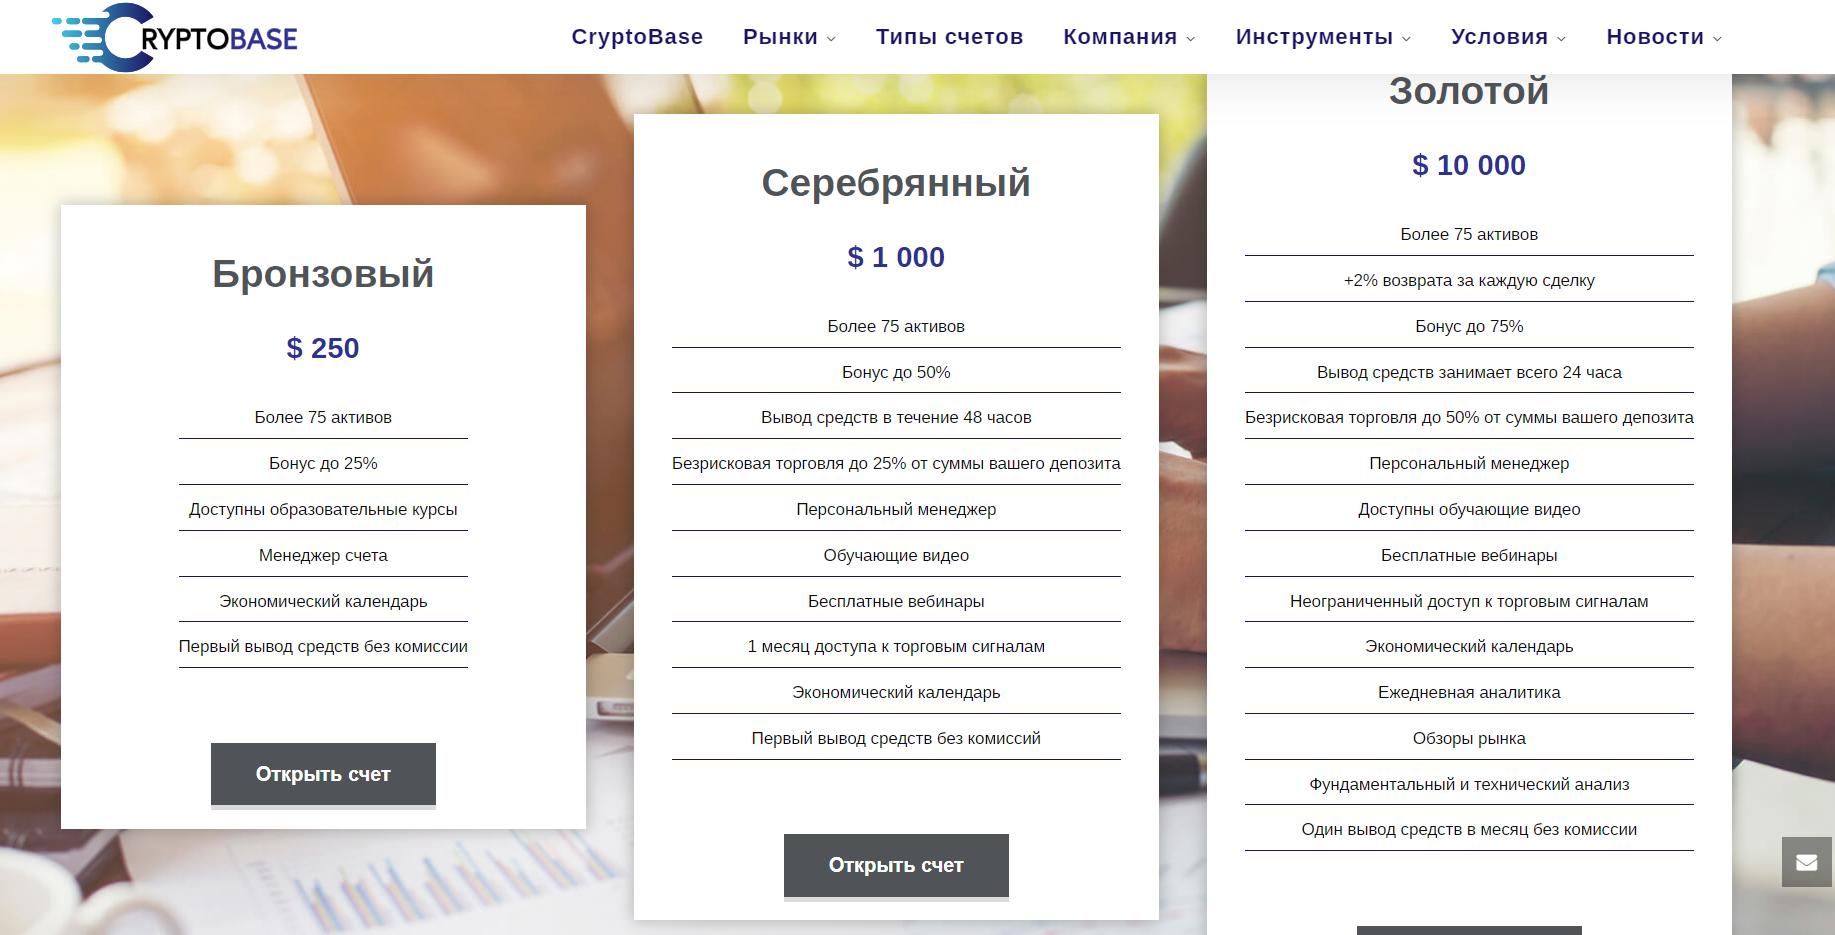 Coinbase типы счетов